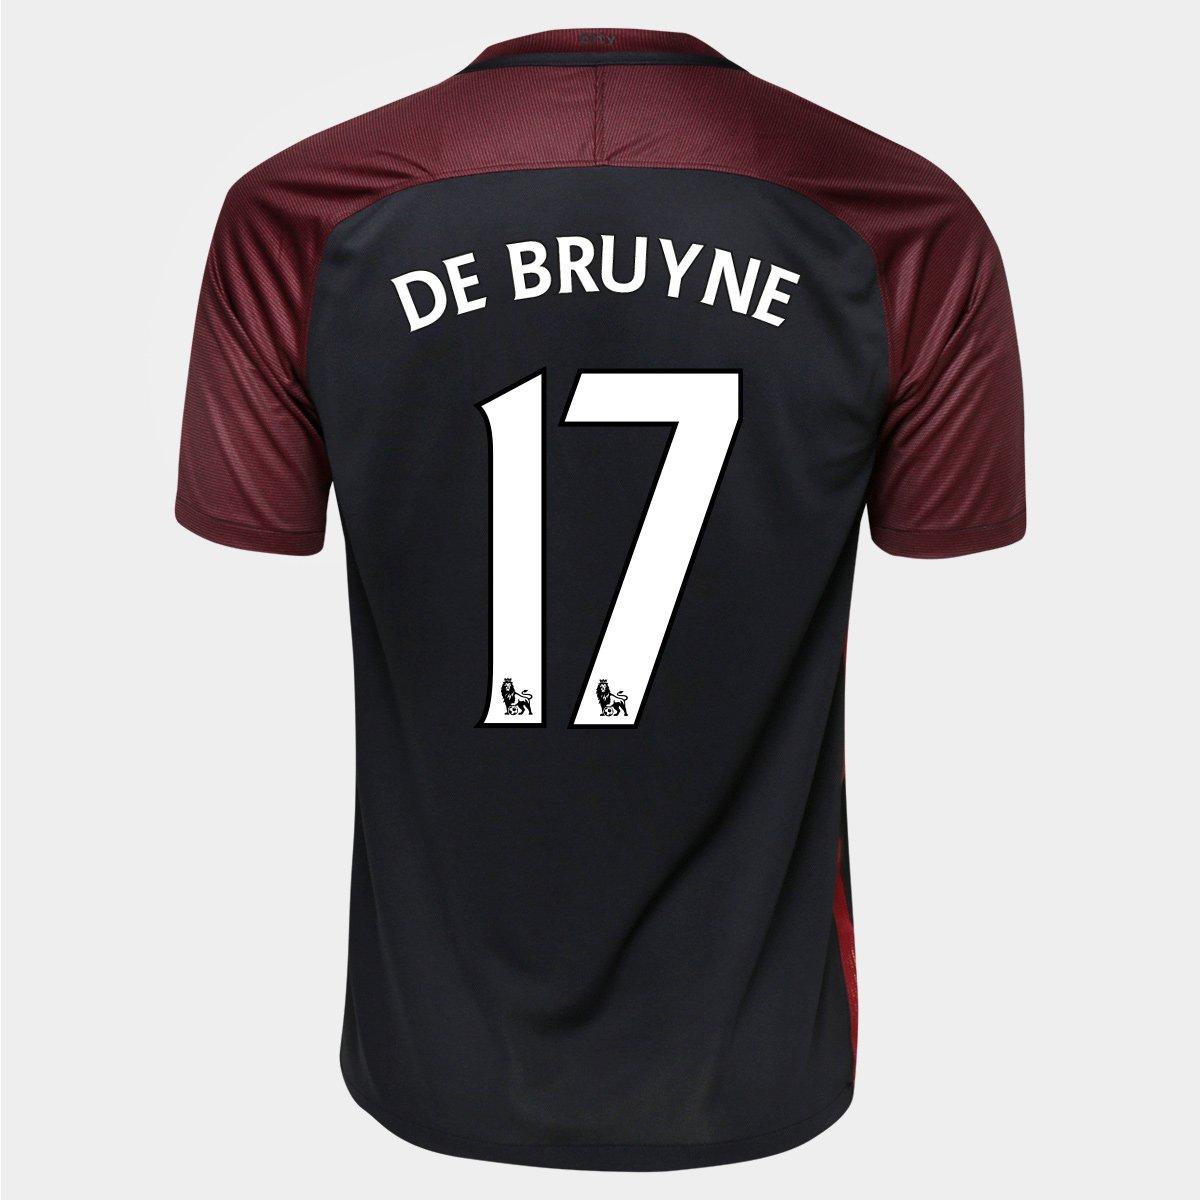 Camisa Nike Manchester City Away 16 17 n° 17 - De Bruyne - Compre Agora  7627a41ee33